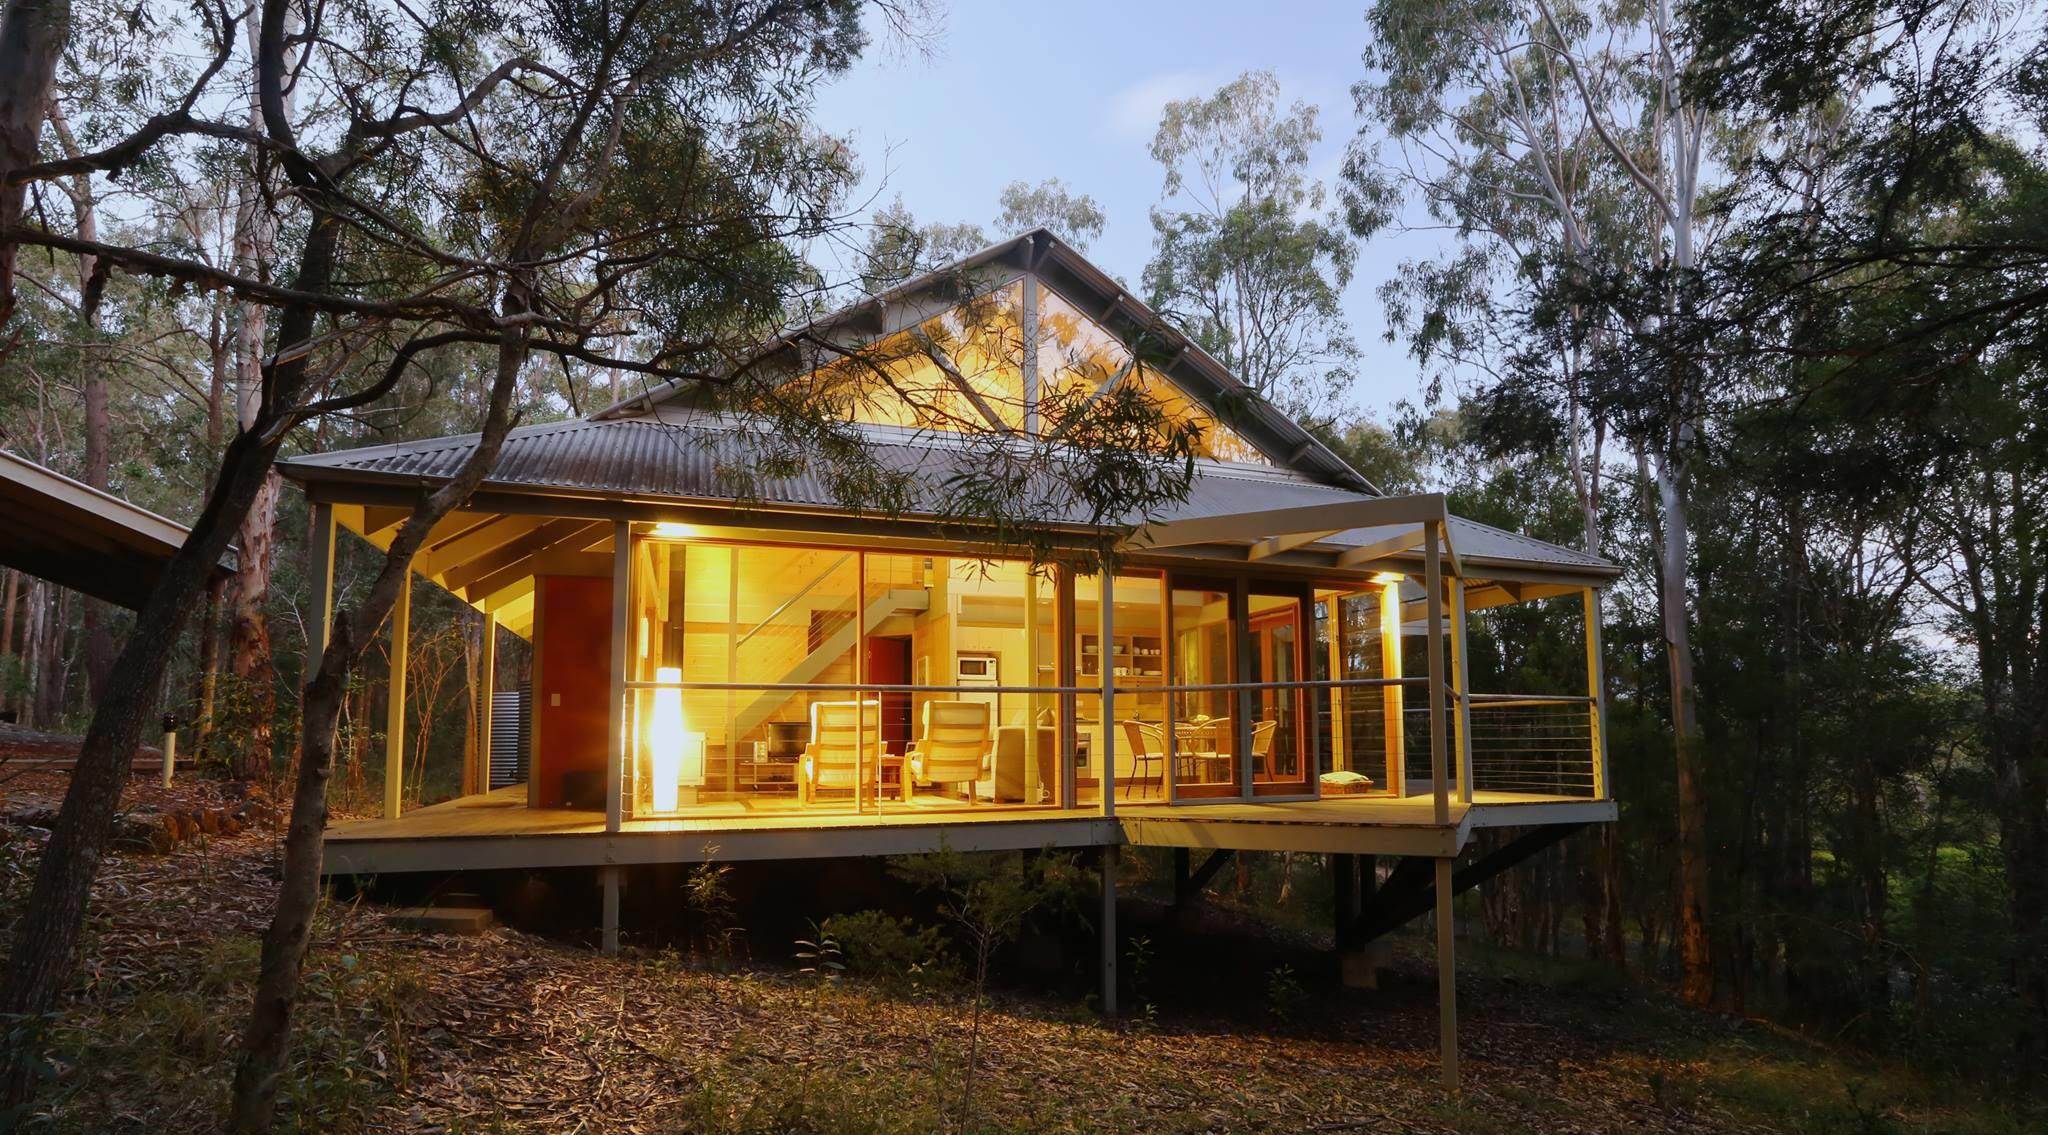 bombah-point-eco-cottage-at-dusk.jpg